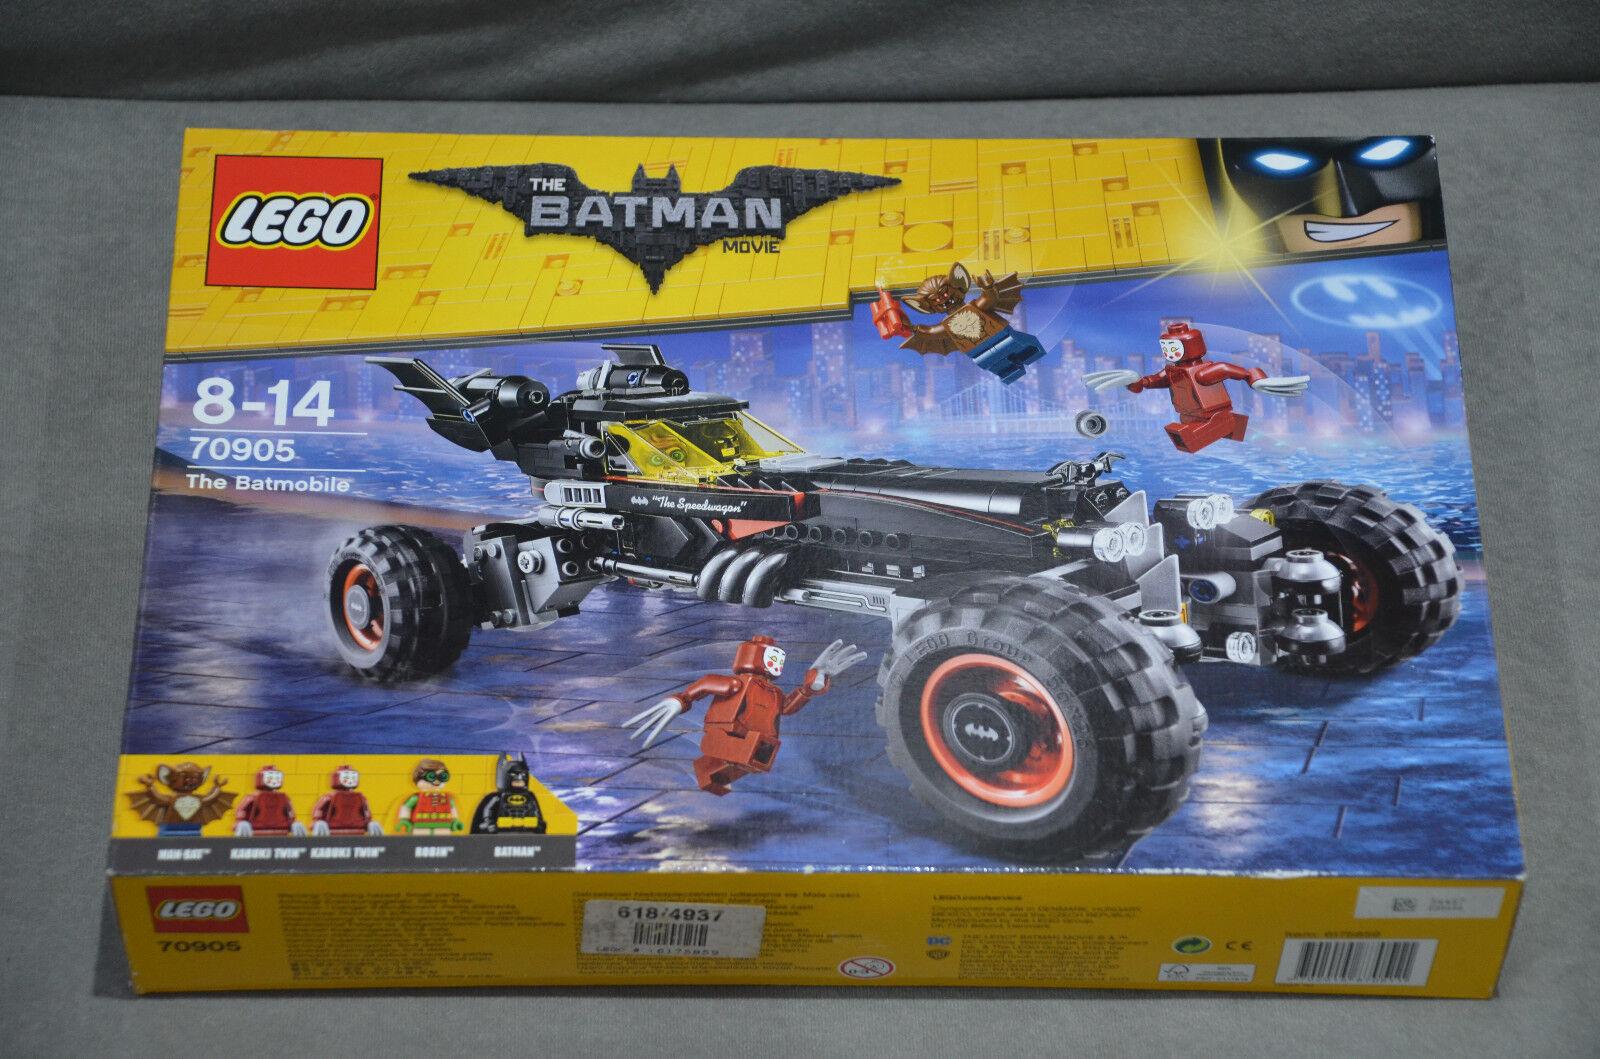 LEGO 70905 The Batman Movie The Batmobile 581 Pcs 2017 Brand New In Sealed Box